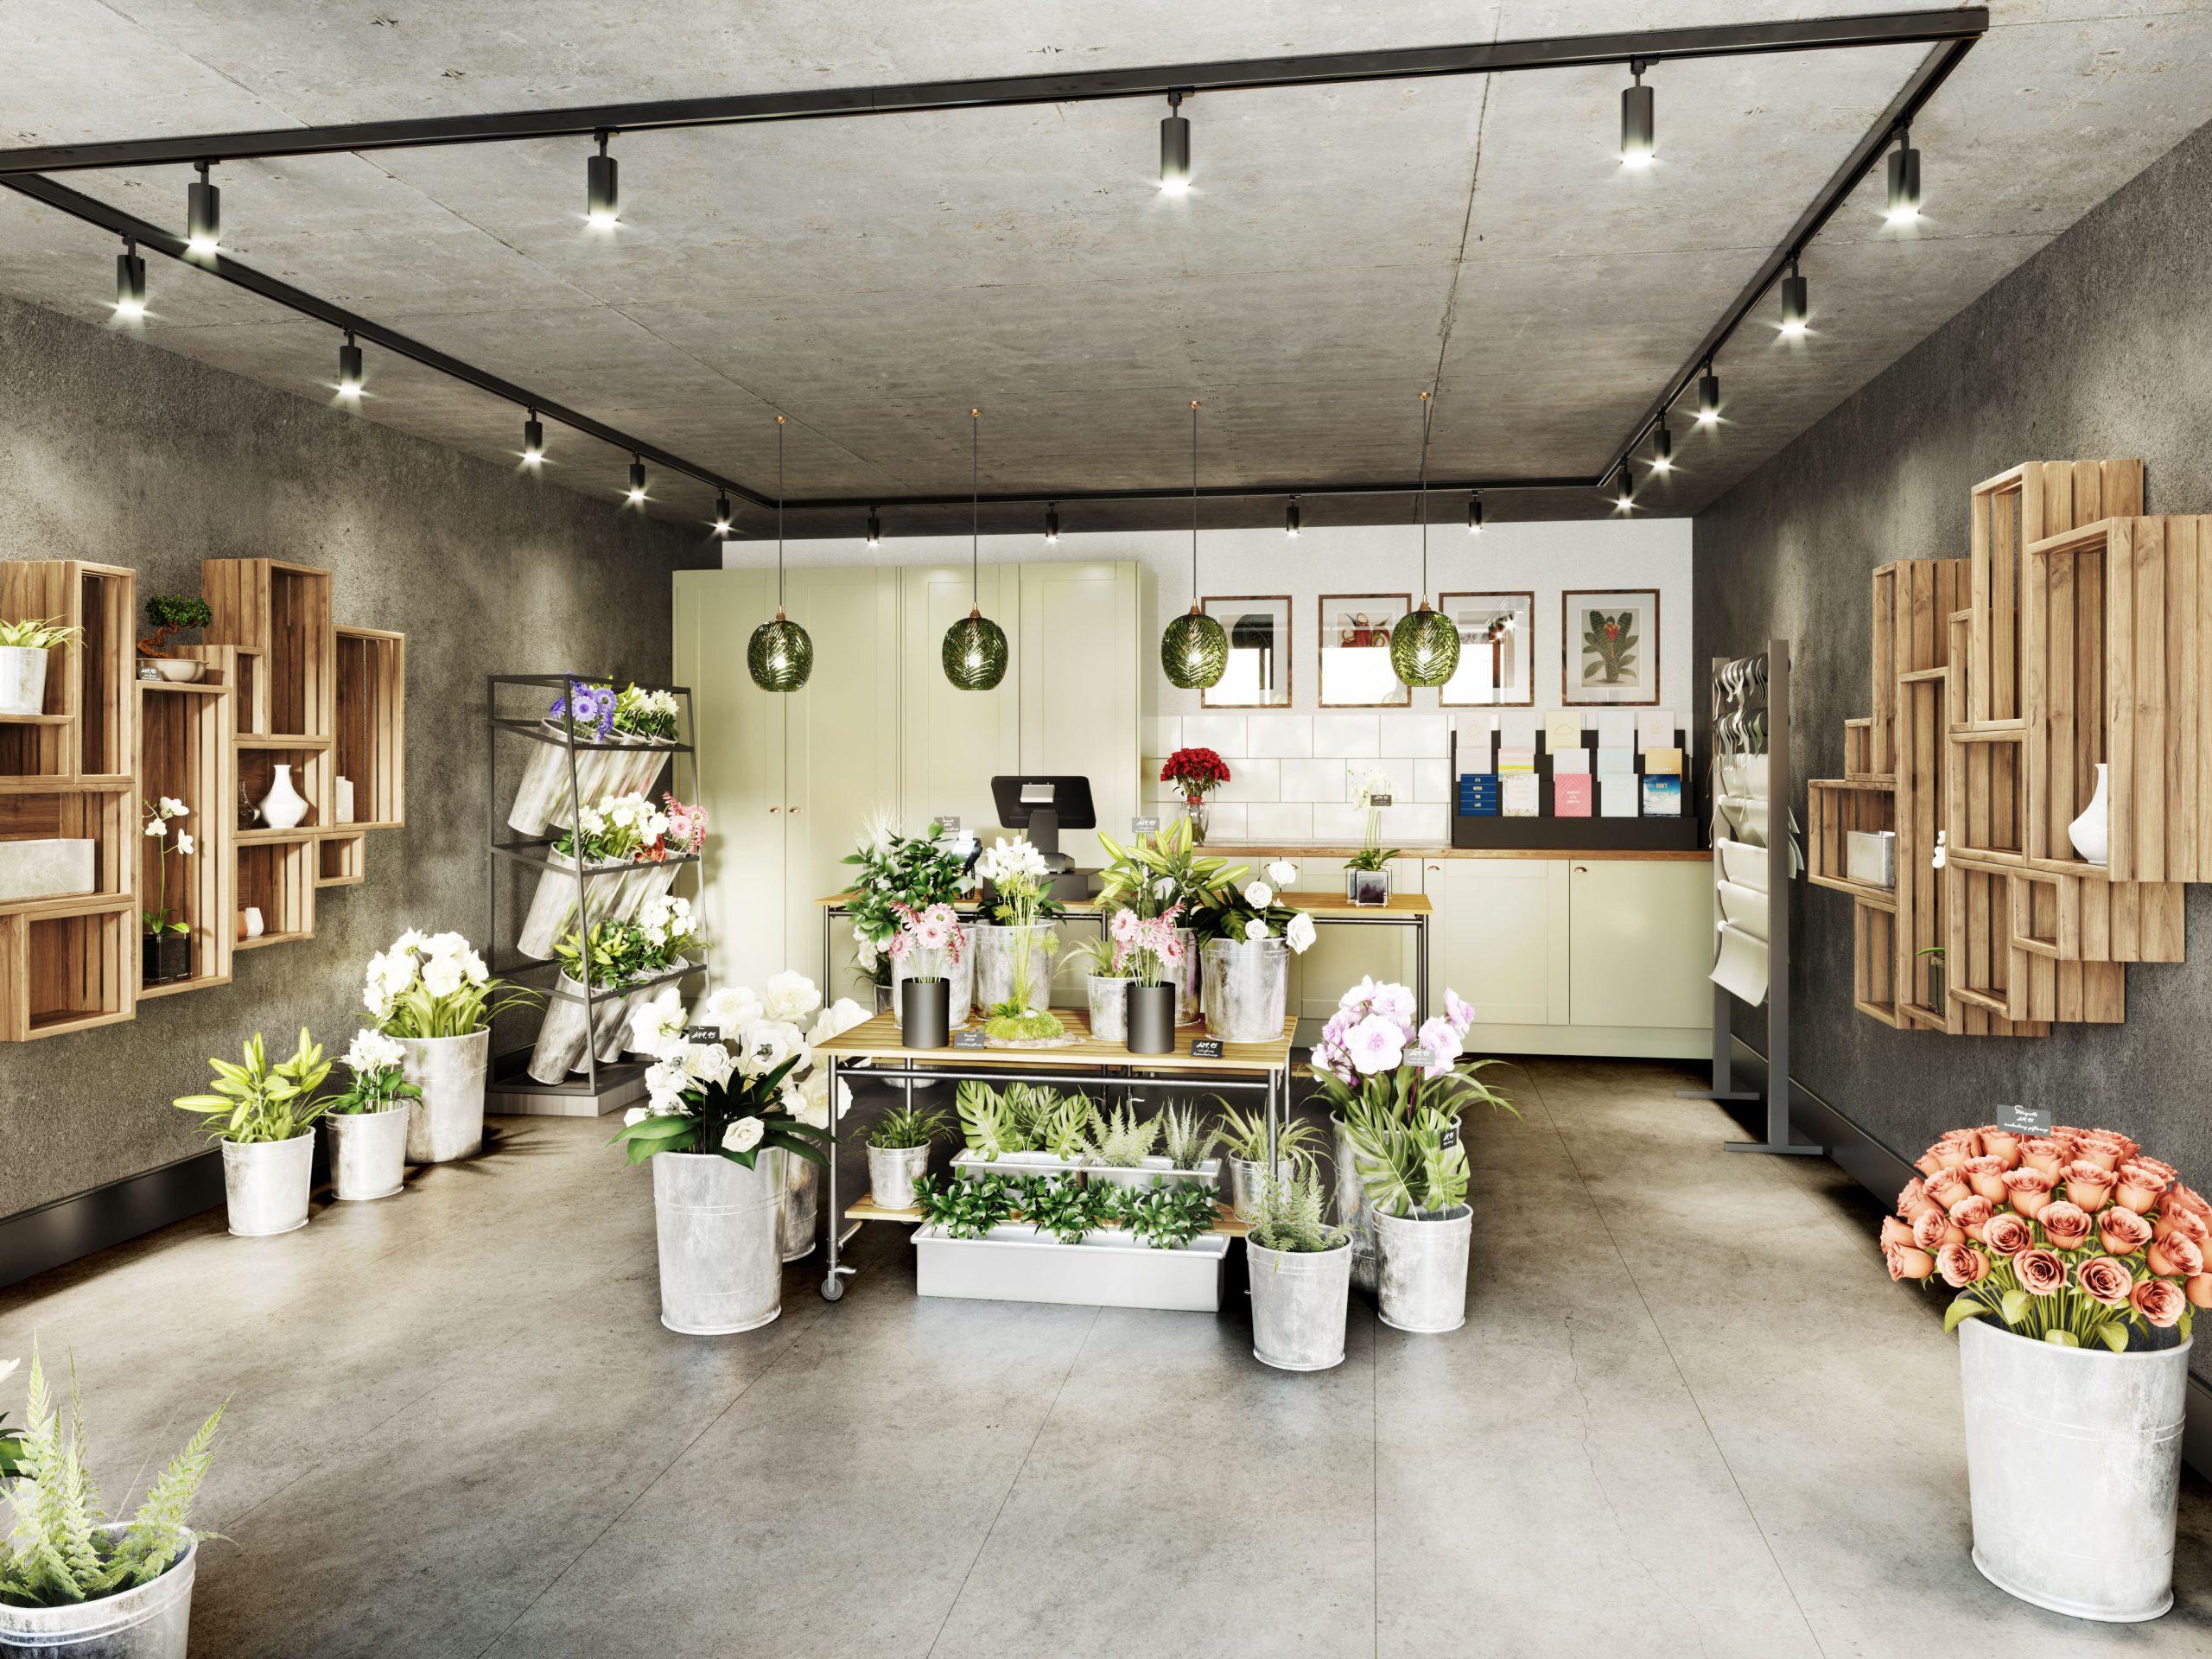 Heaton Group_Bishopgate_Preston_Retail_Space_Interior_Visualisation_CGI_FLORIST